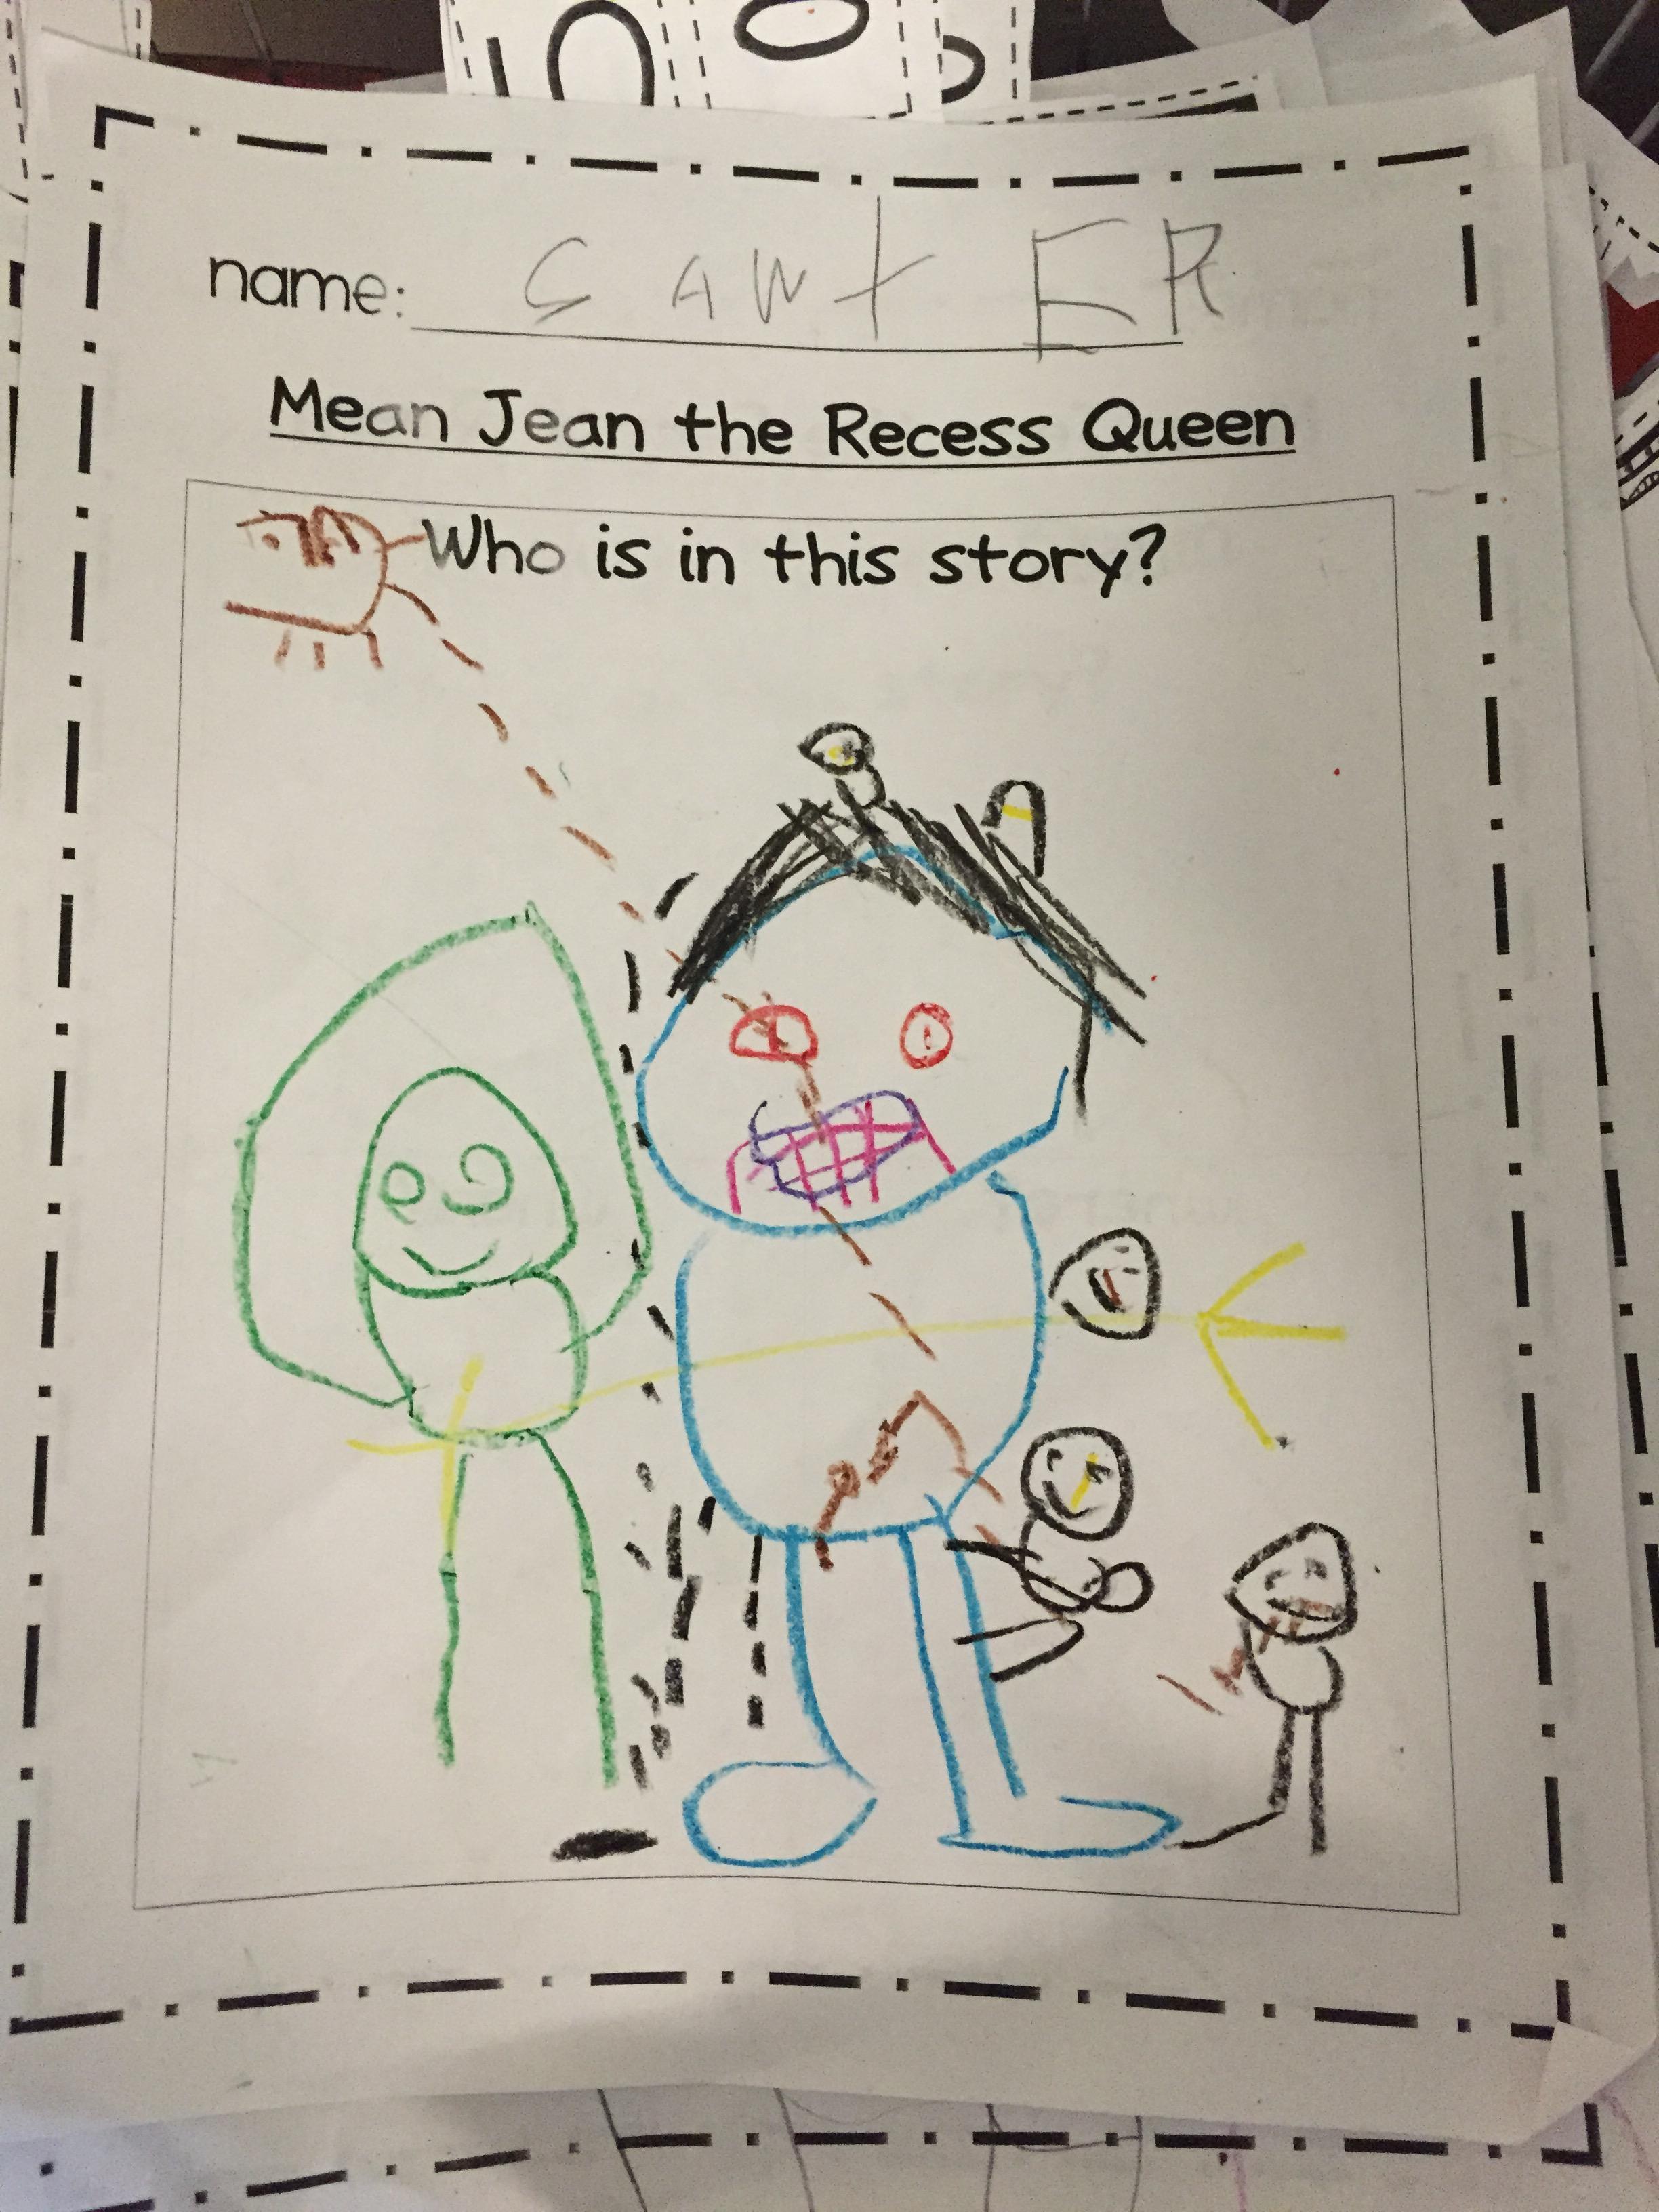 Mean Jean The Recess Queen